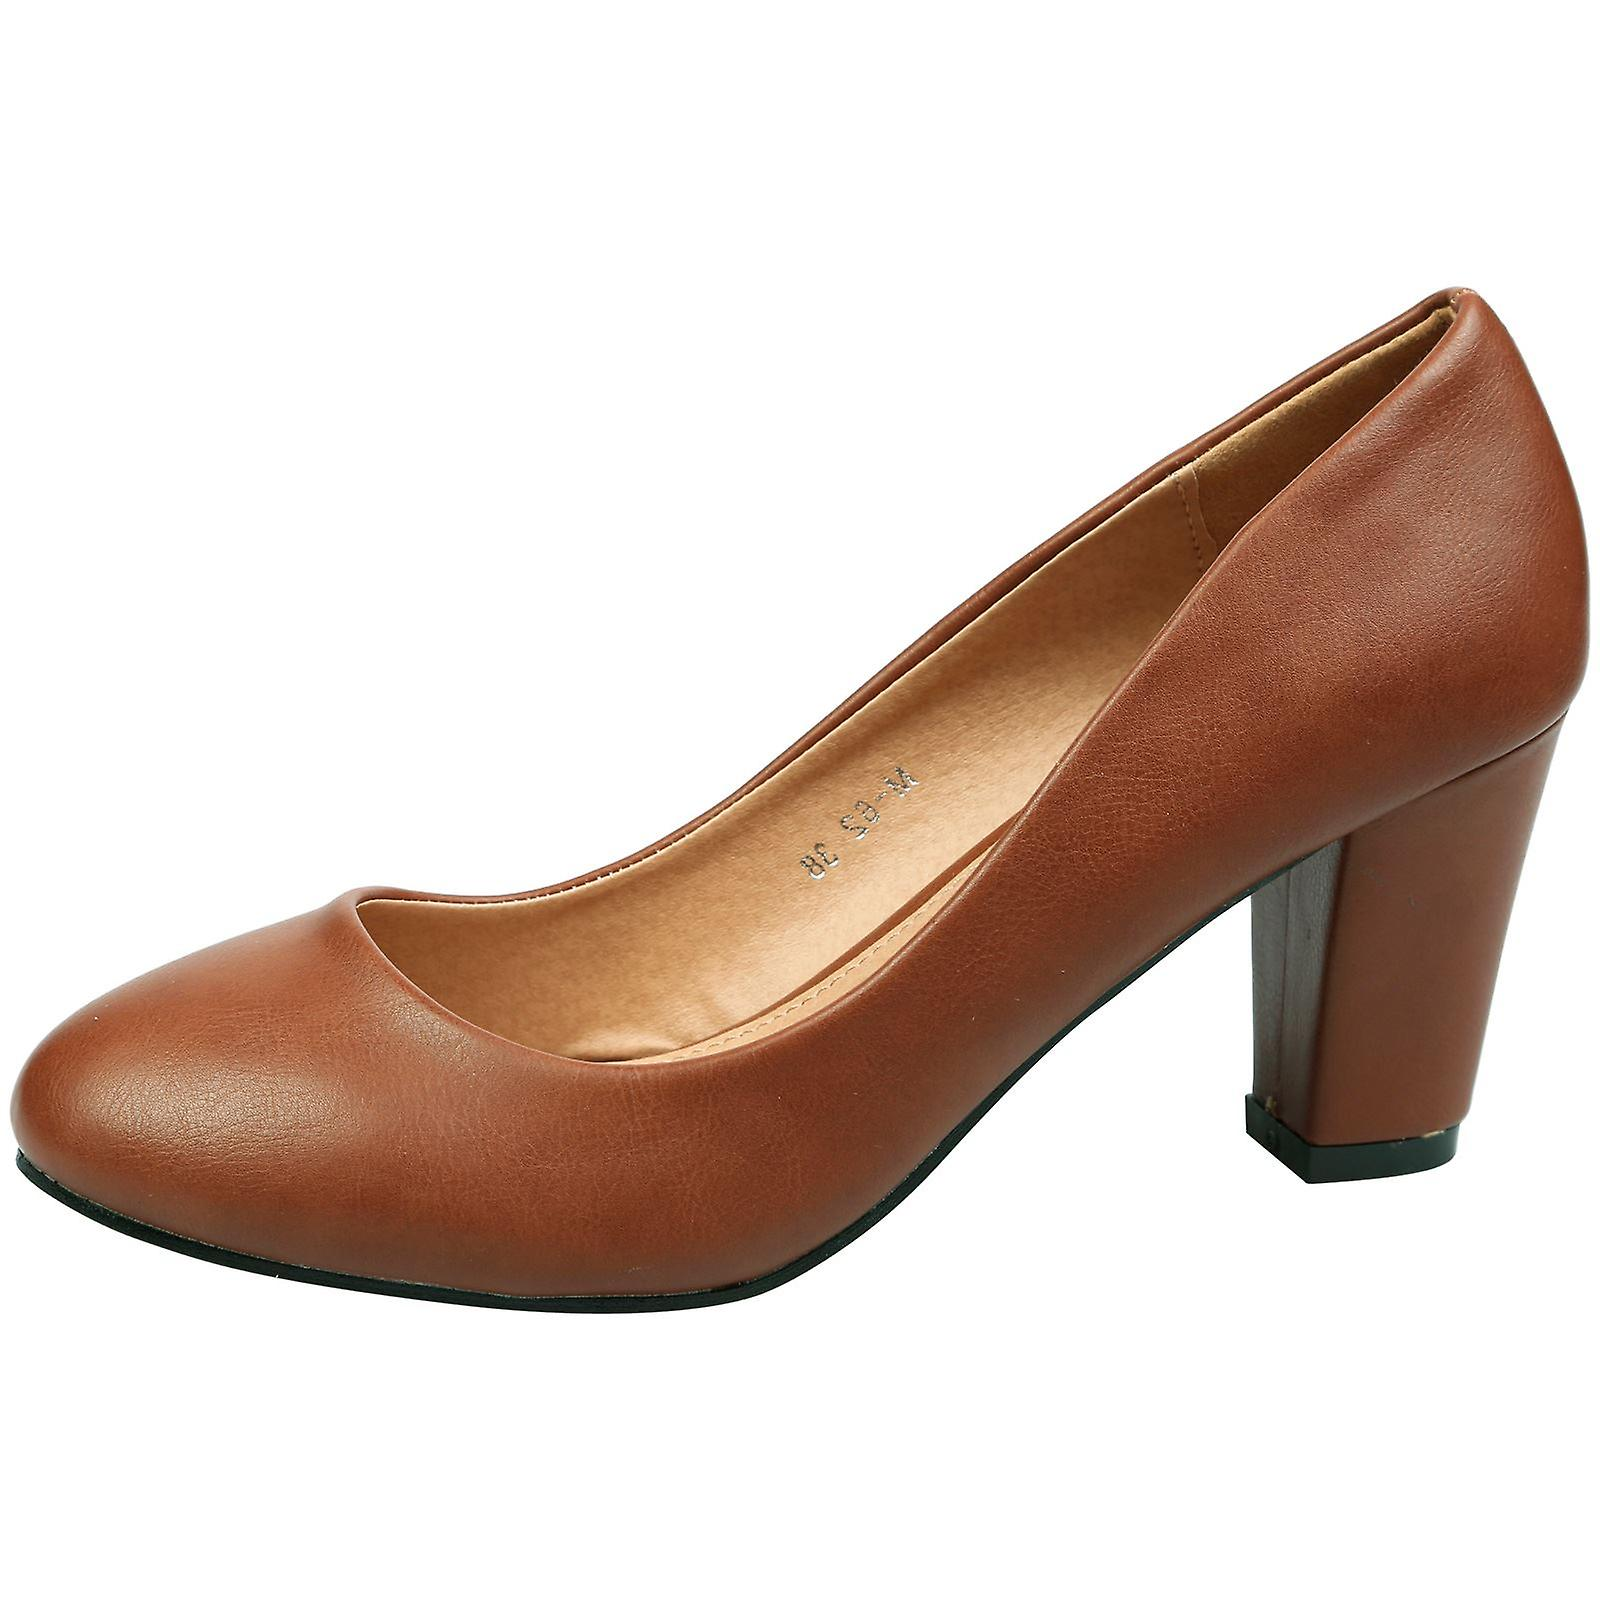 Reeva Womens Mid Block Heel Slip On Court Shoes